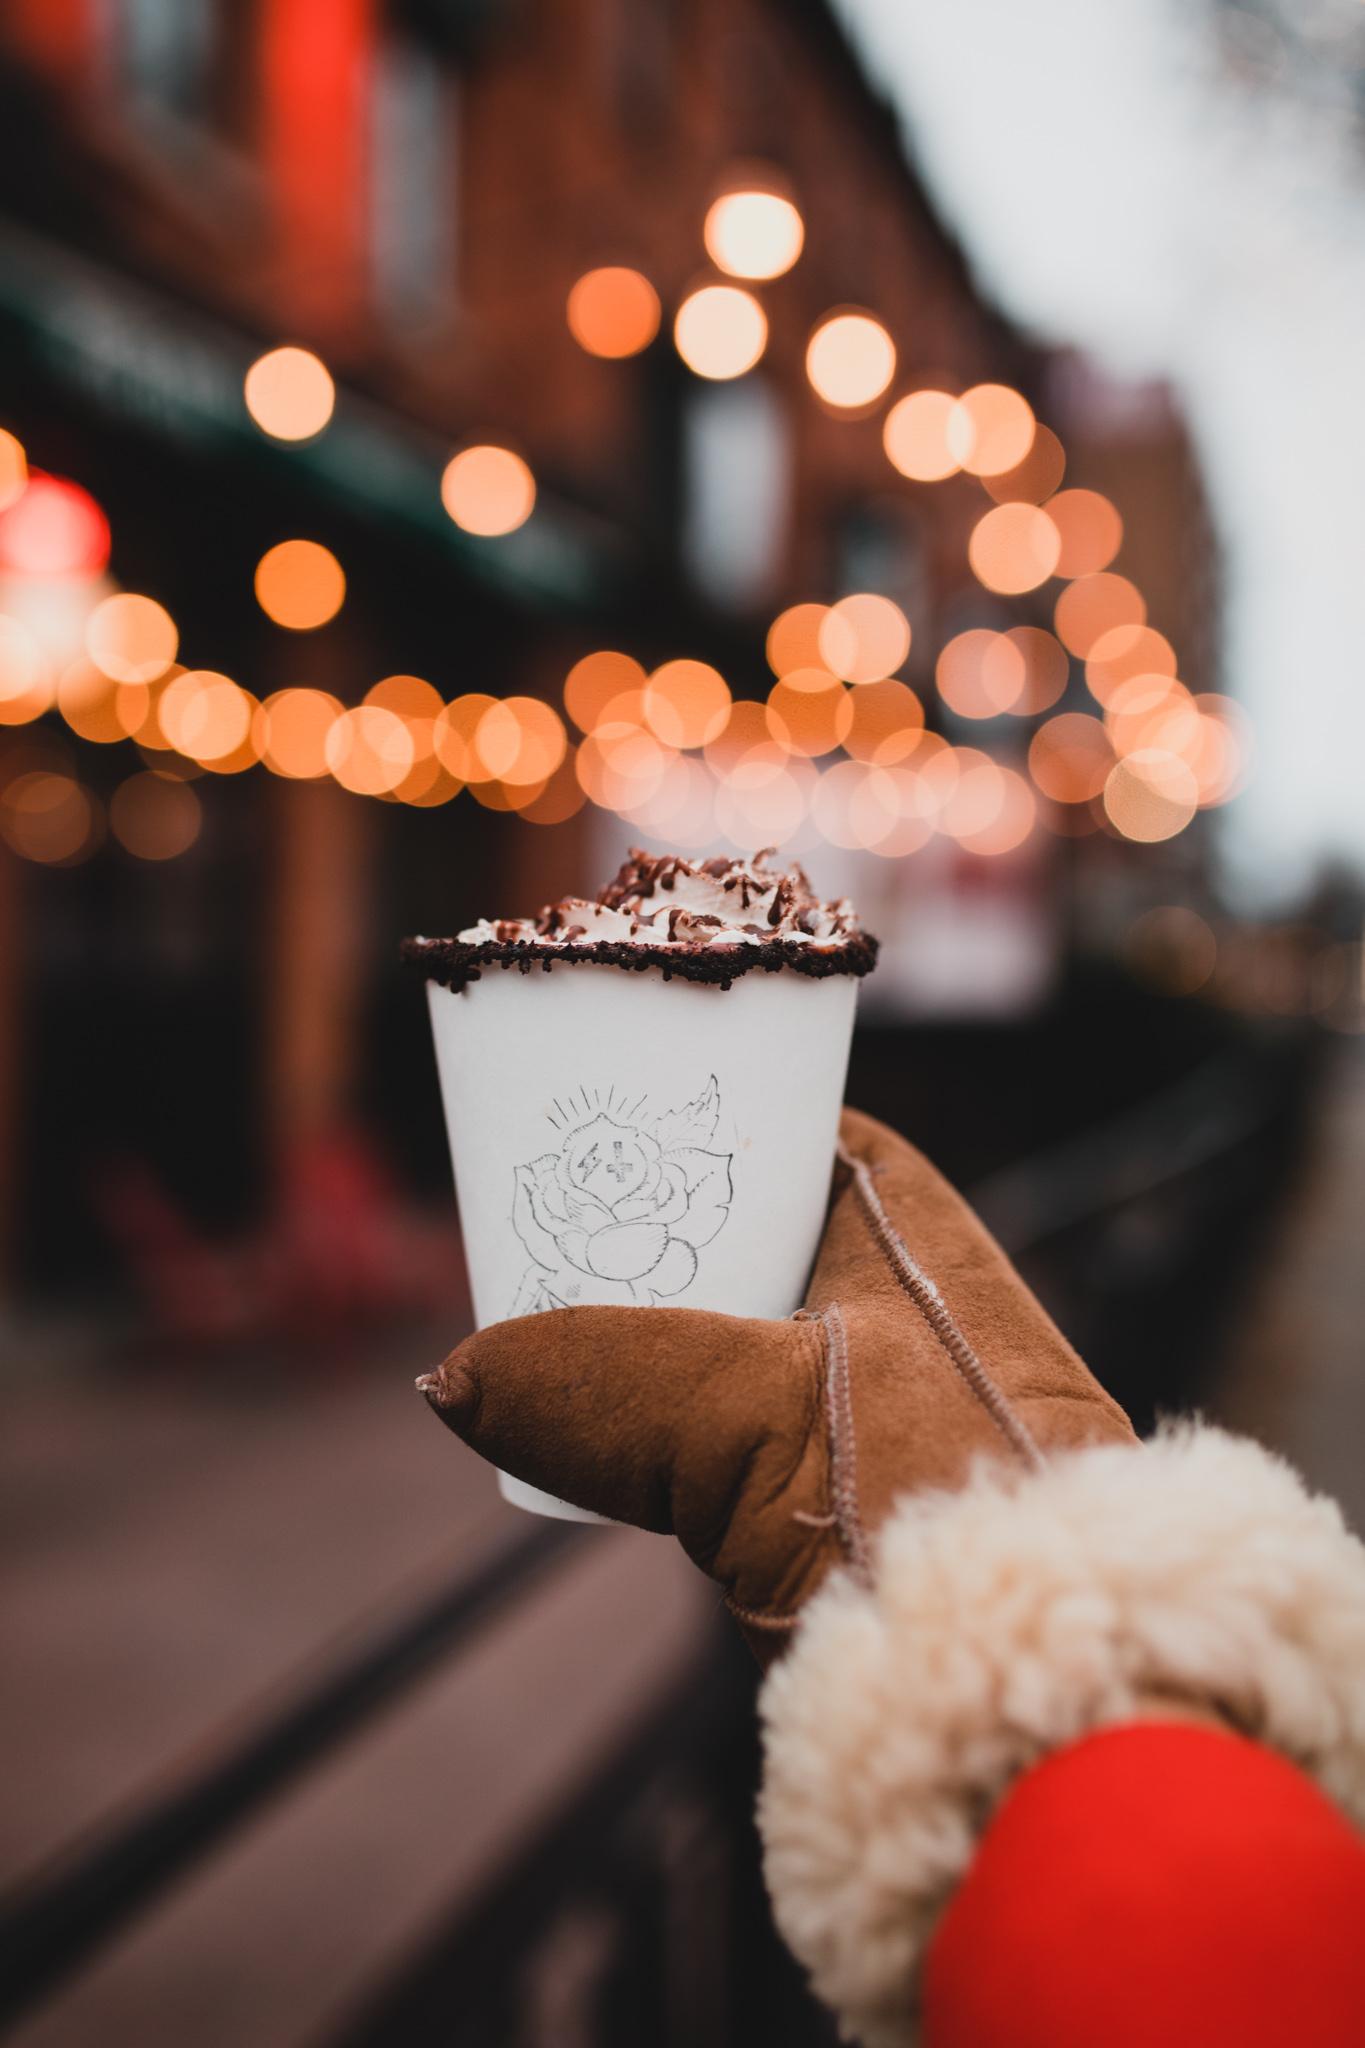 Hot chocolate downtown ottawa